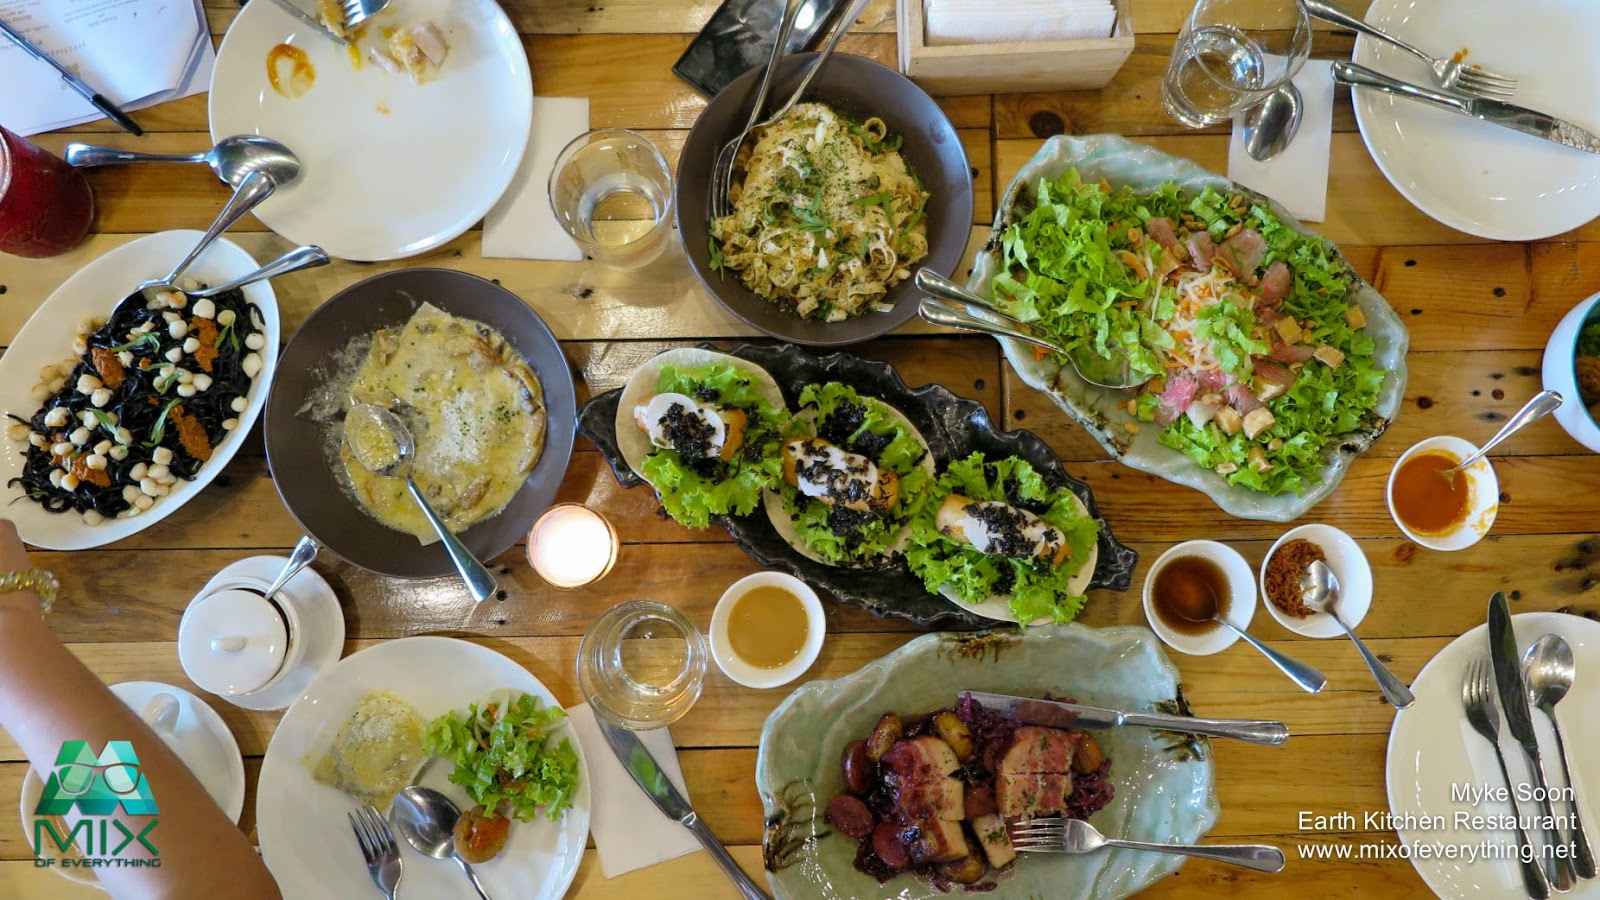 Earth Kitchen Restaurant Farm to Table Treat Hello